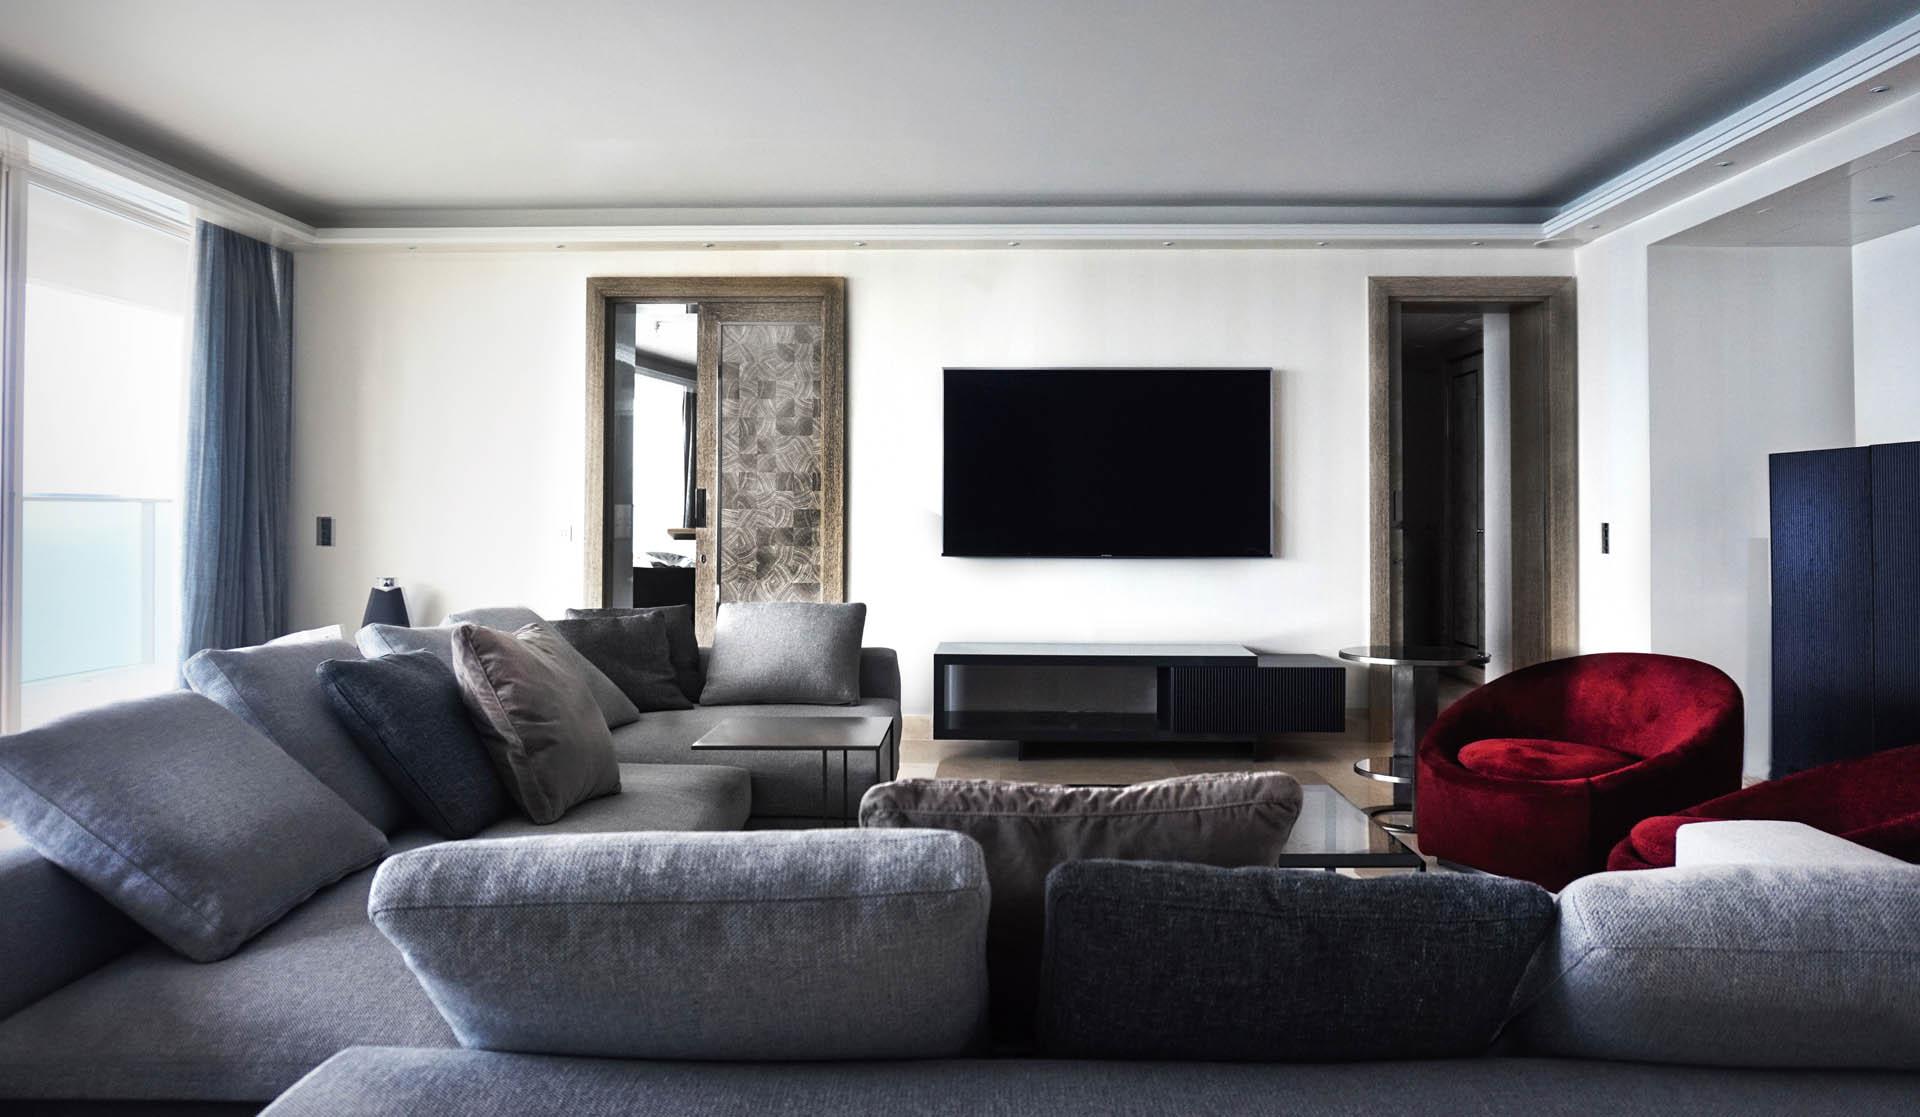 michele mantovani studio architecture formiture design interiors. Black Bedroom Furniture Sets. Home Design Ideas